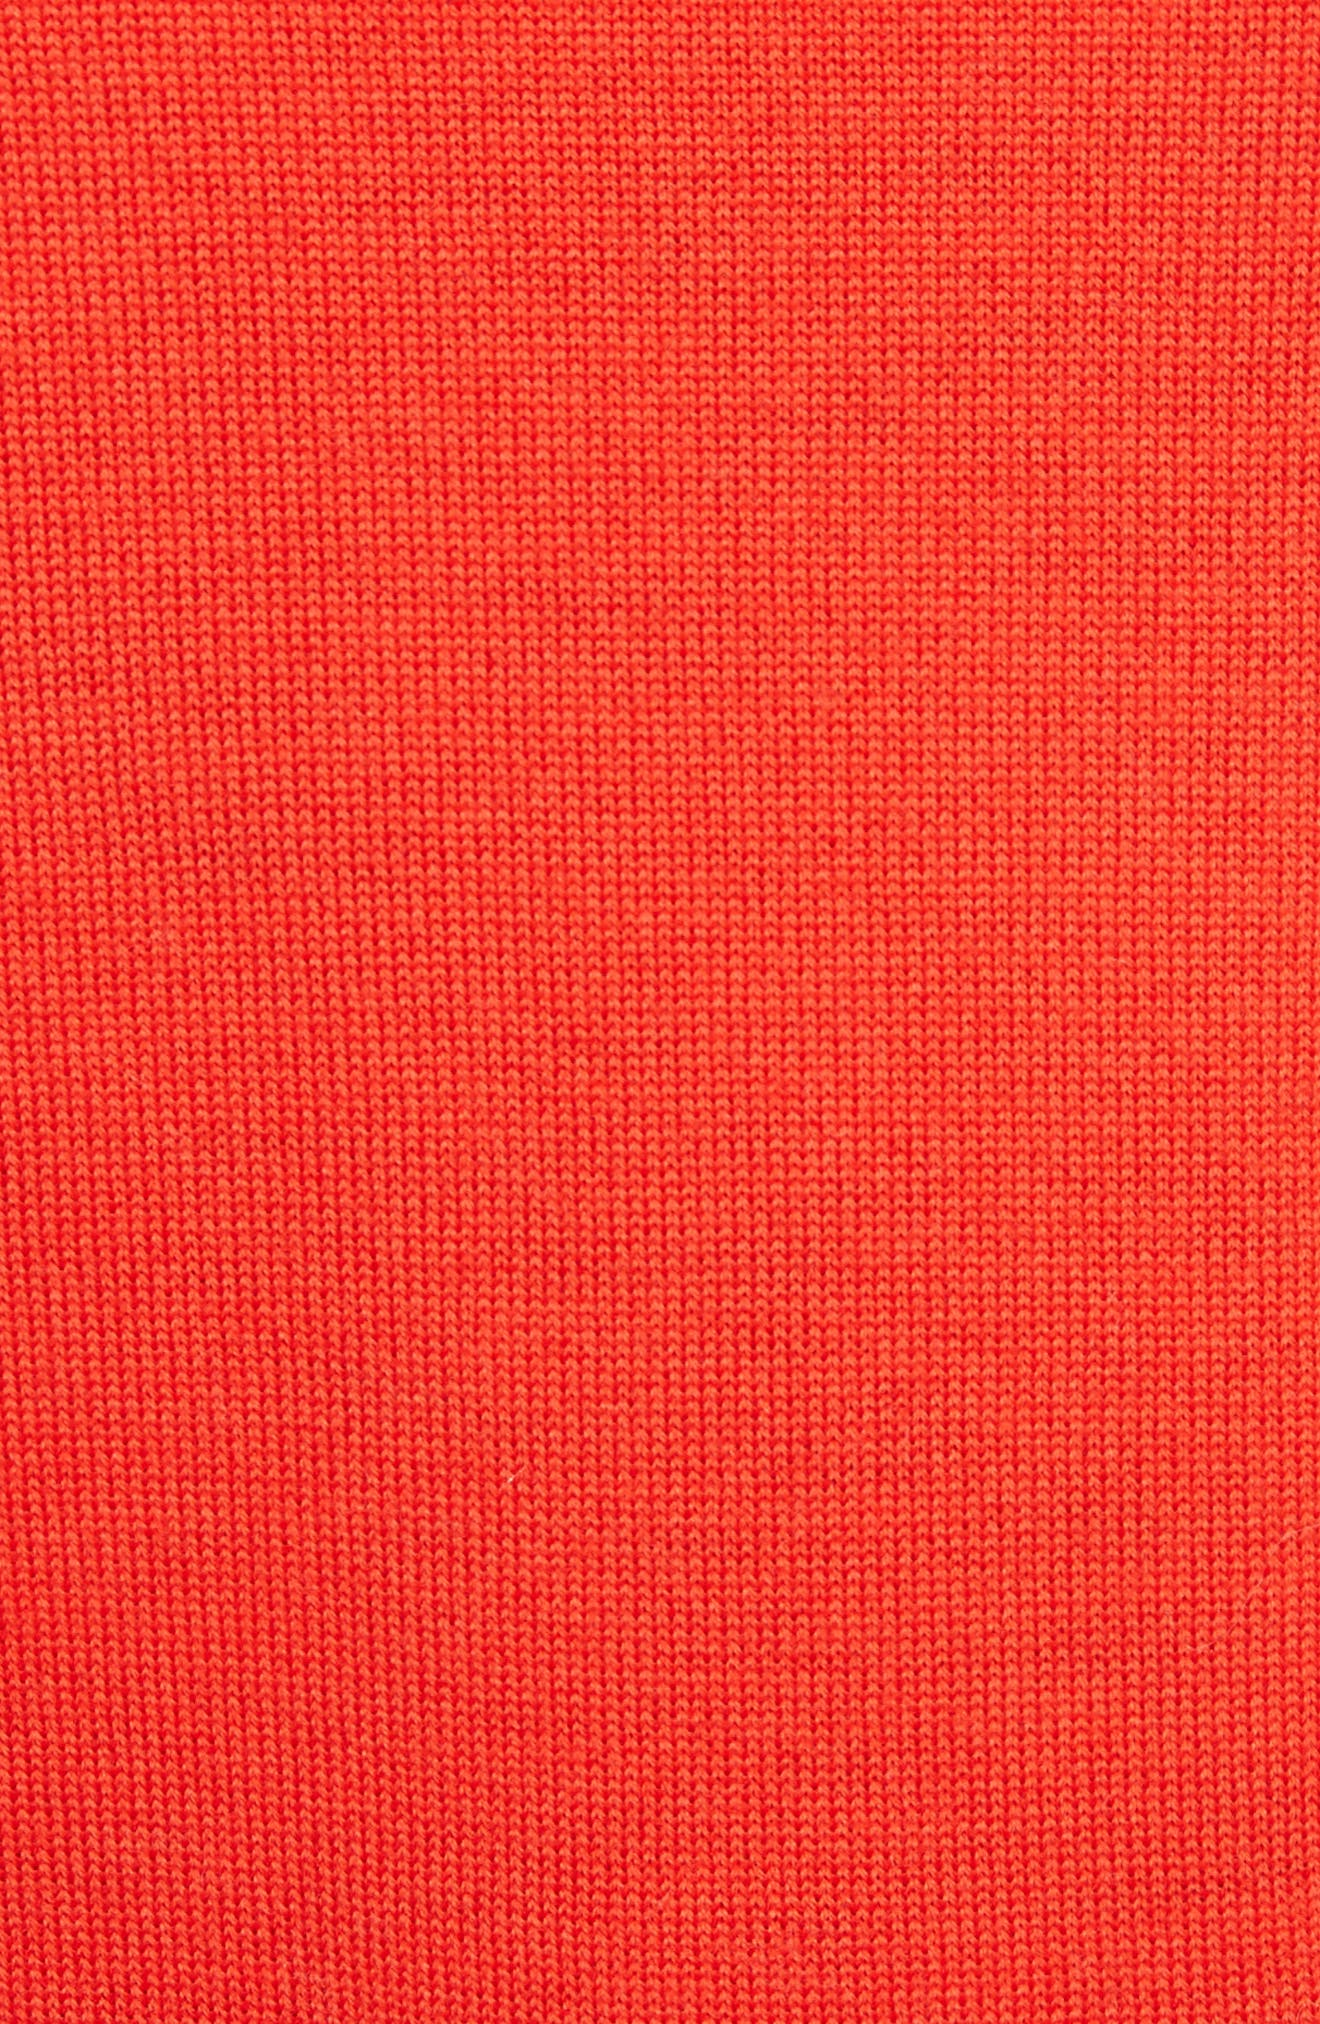 Saeta Tie Cuff Sweater,                             Alternate thumbnail 5, color,